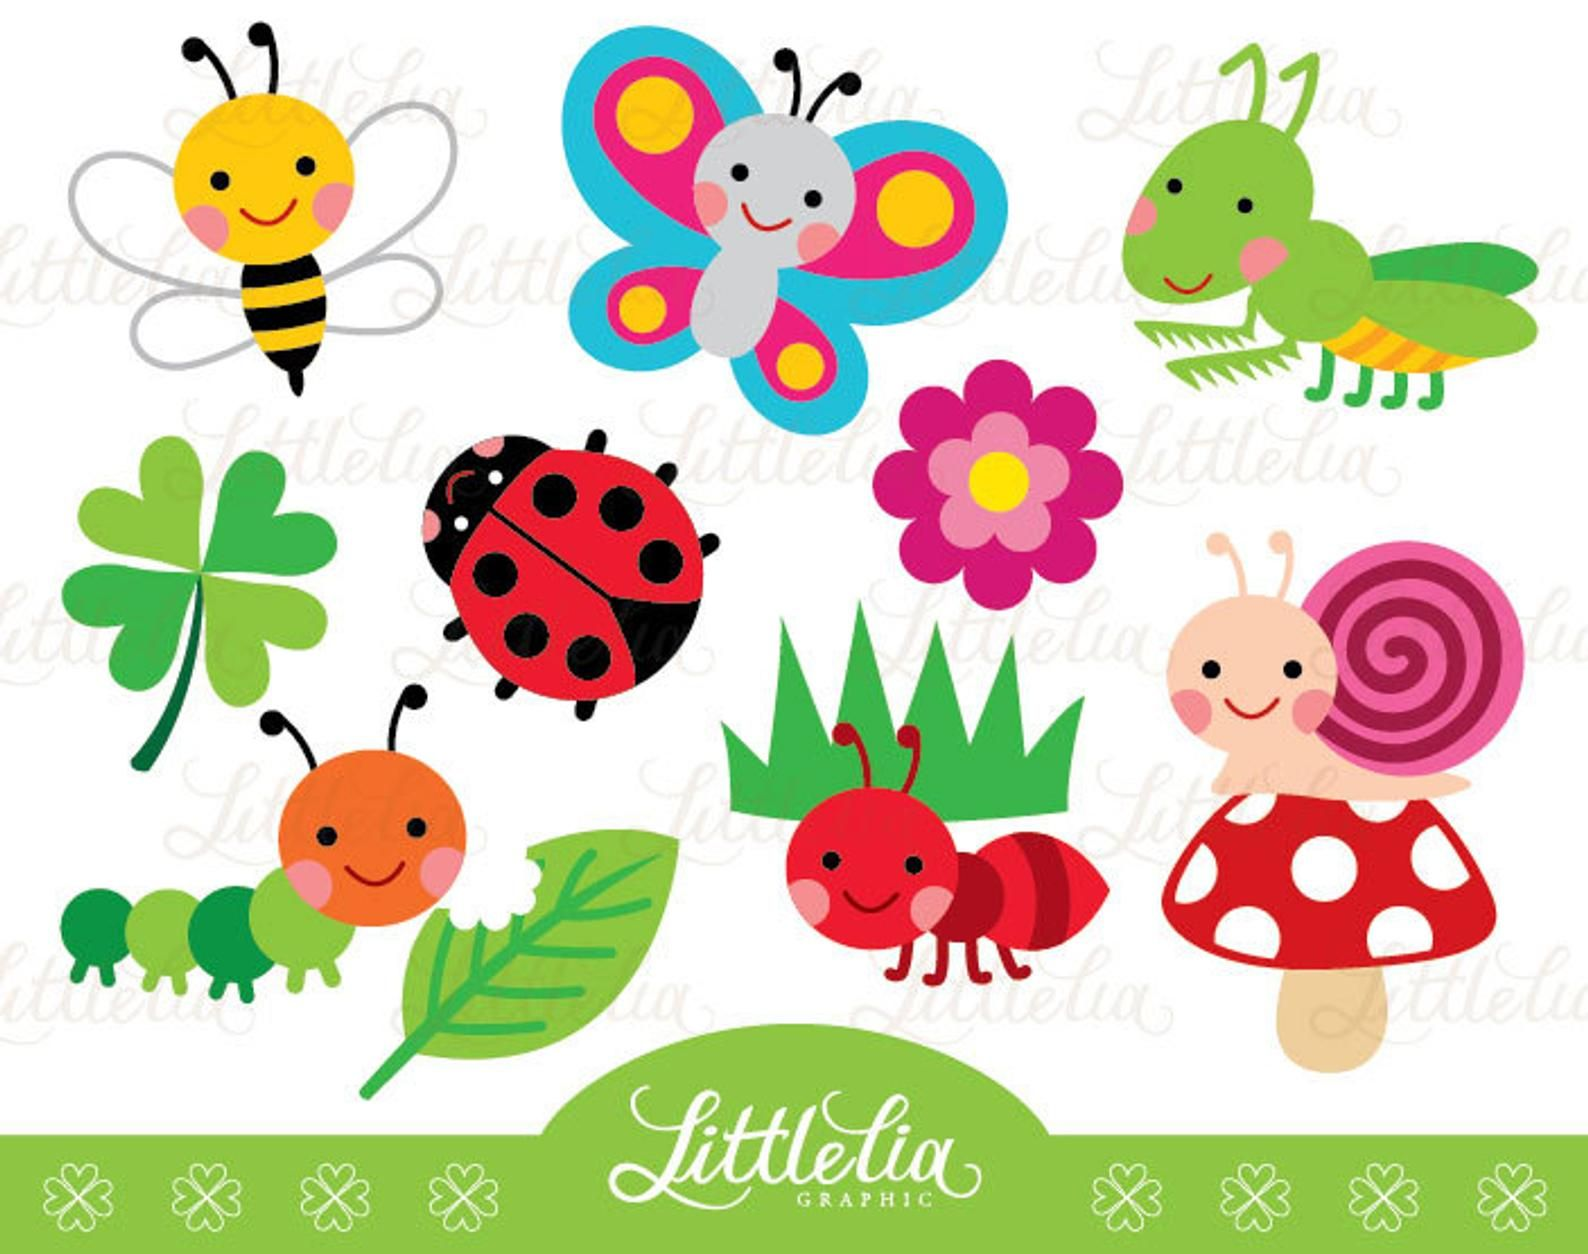 Garden Bug Cute Digital Clipart 14037 Instant Download Etsy Clip Art Digital Clip Art Mothers Day Crafts For Kids